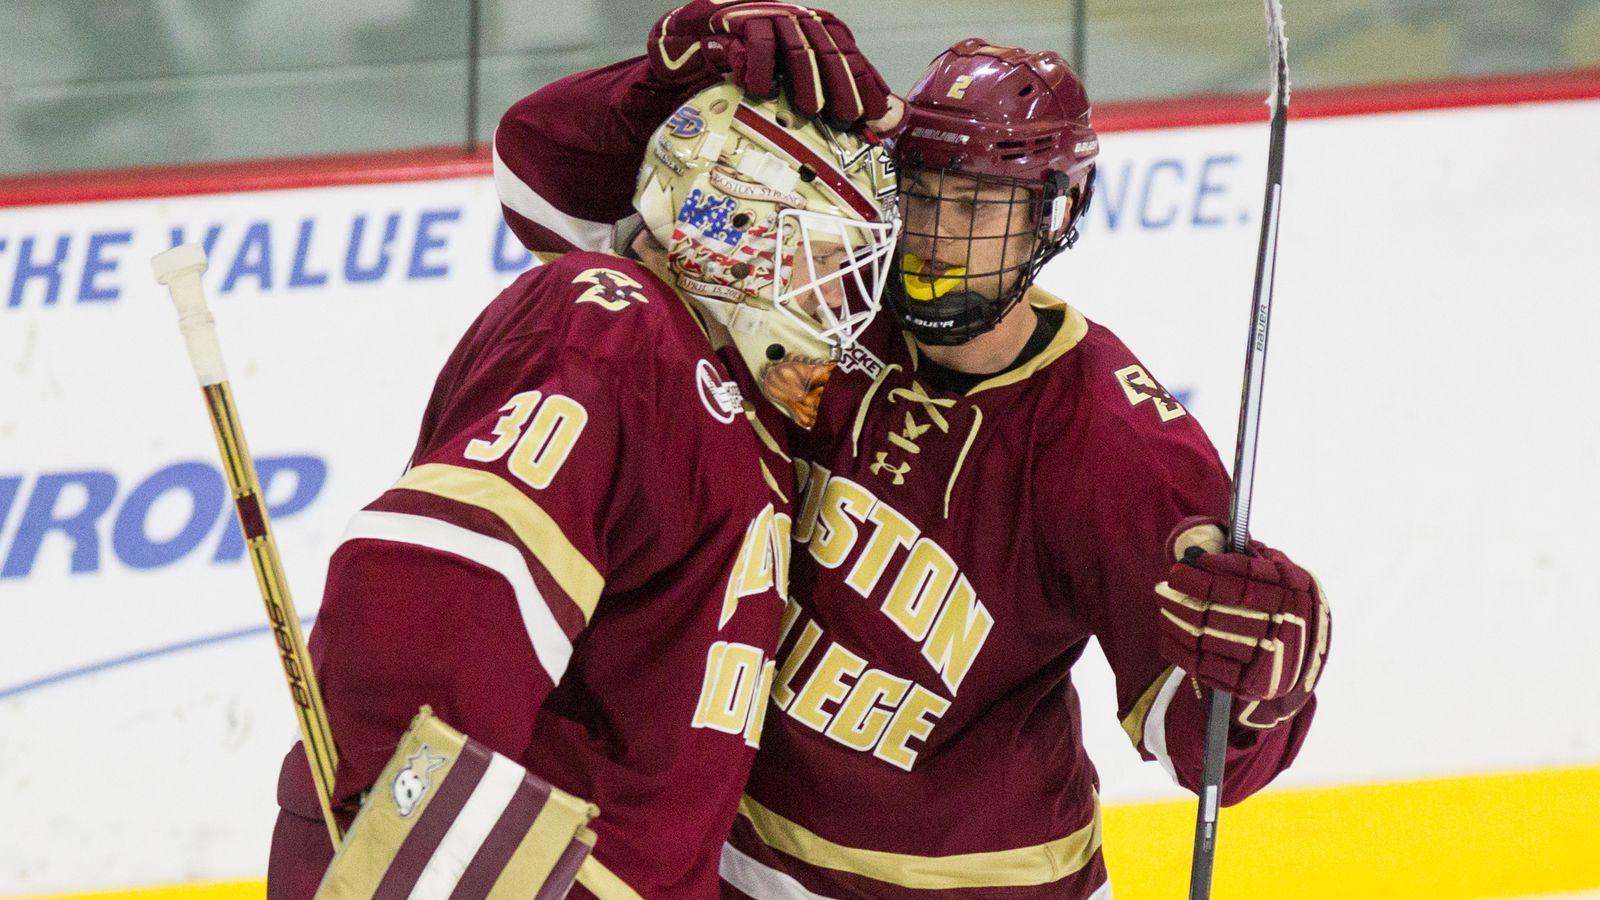 Boston-college-vs-army-mens-hockey-10-9-15-00x2.0.0